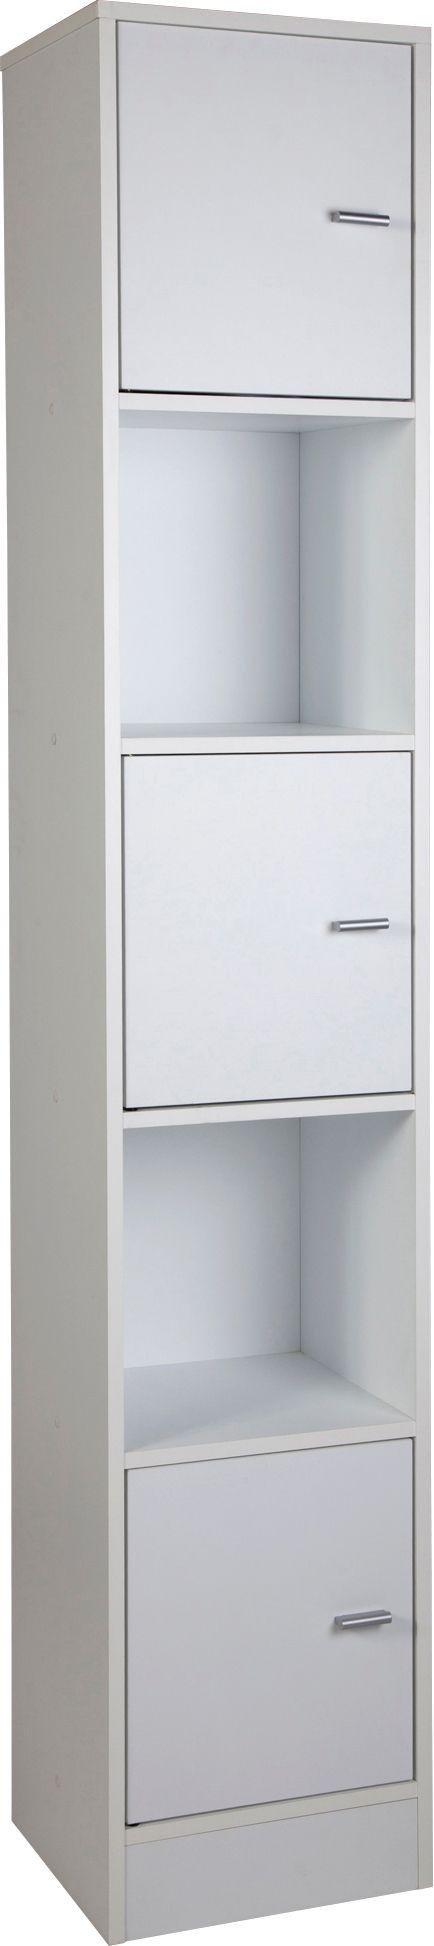 Buy HOME Tall Bathroom Storage Unit White at Argoscouk Your